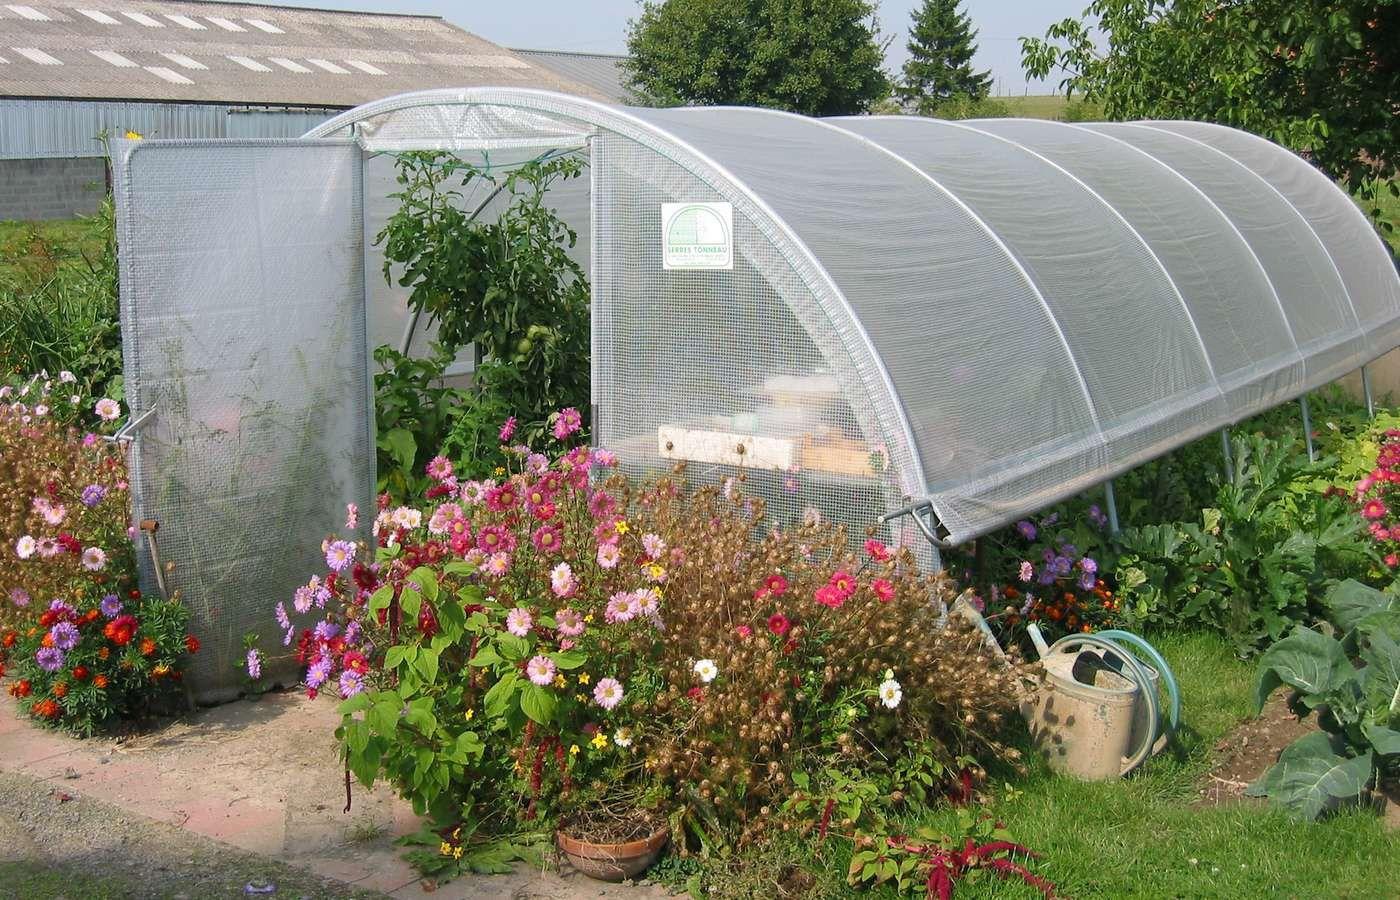 mini serre de jardin etagres plastique serre jardin with mini serre de jardin guide duachat. Black Bedroom Furniture Sets. Home Design Ideas